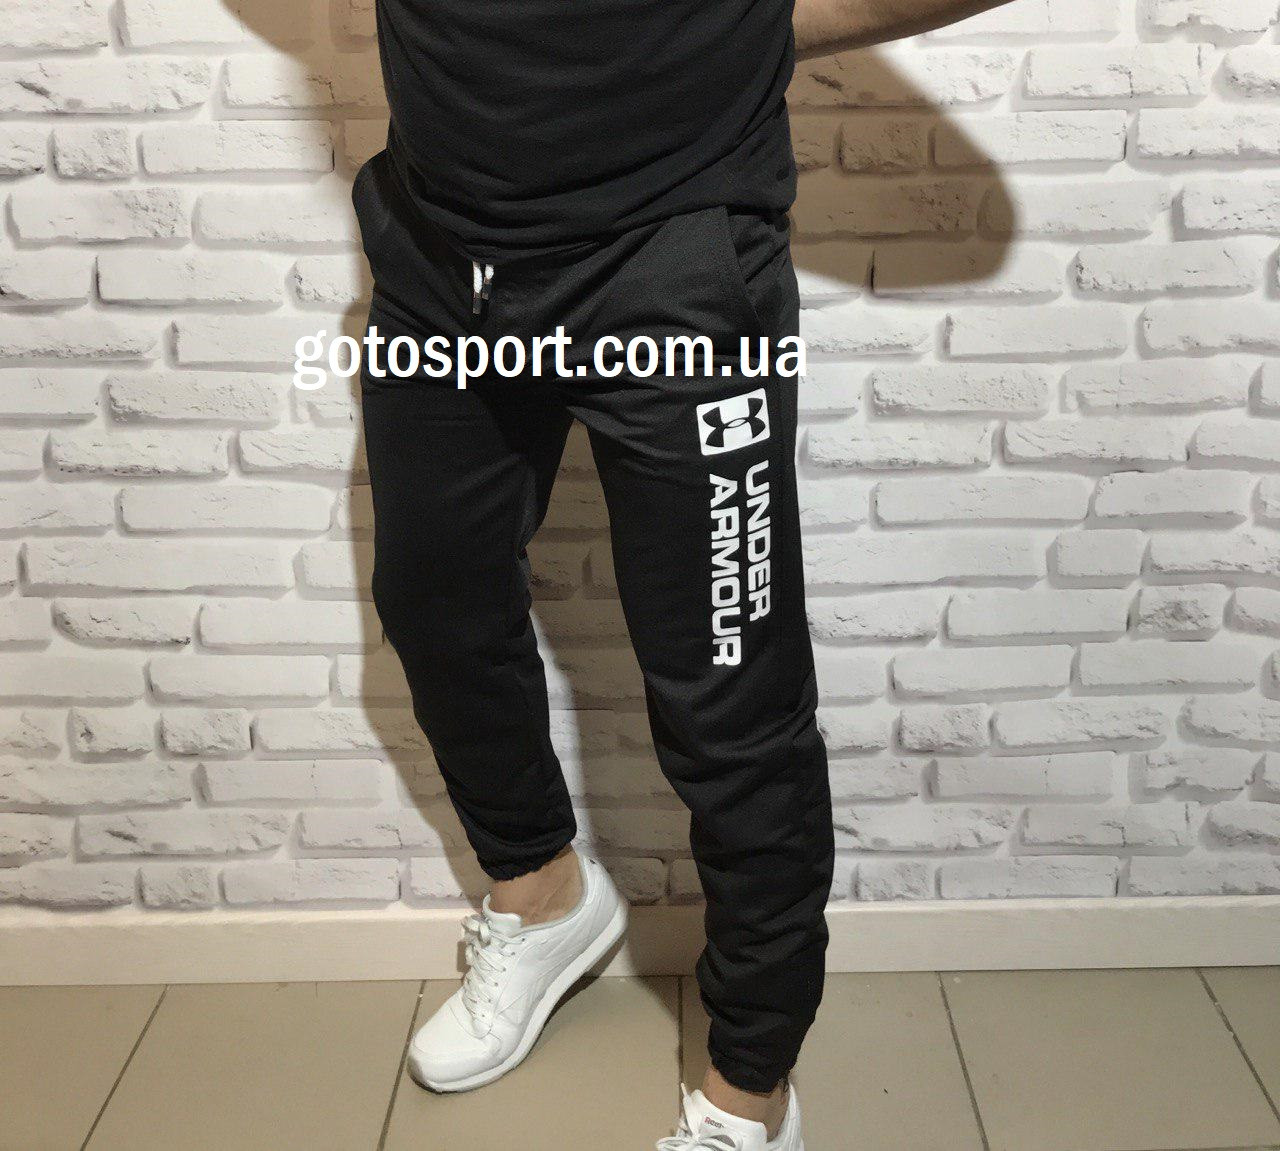 Мужские спортивные штаны Under Armour Black Star